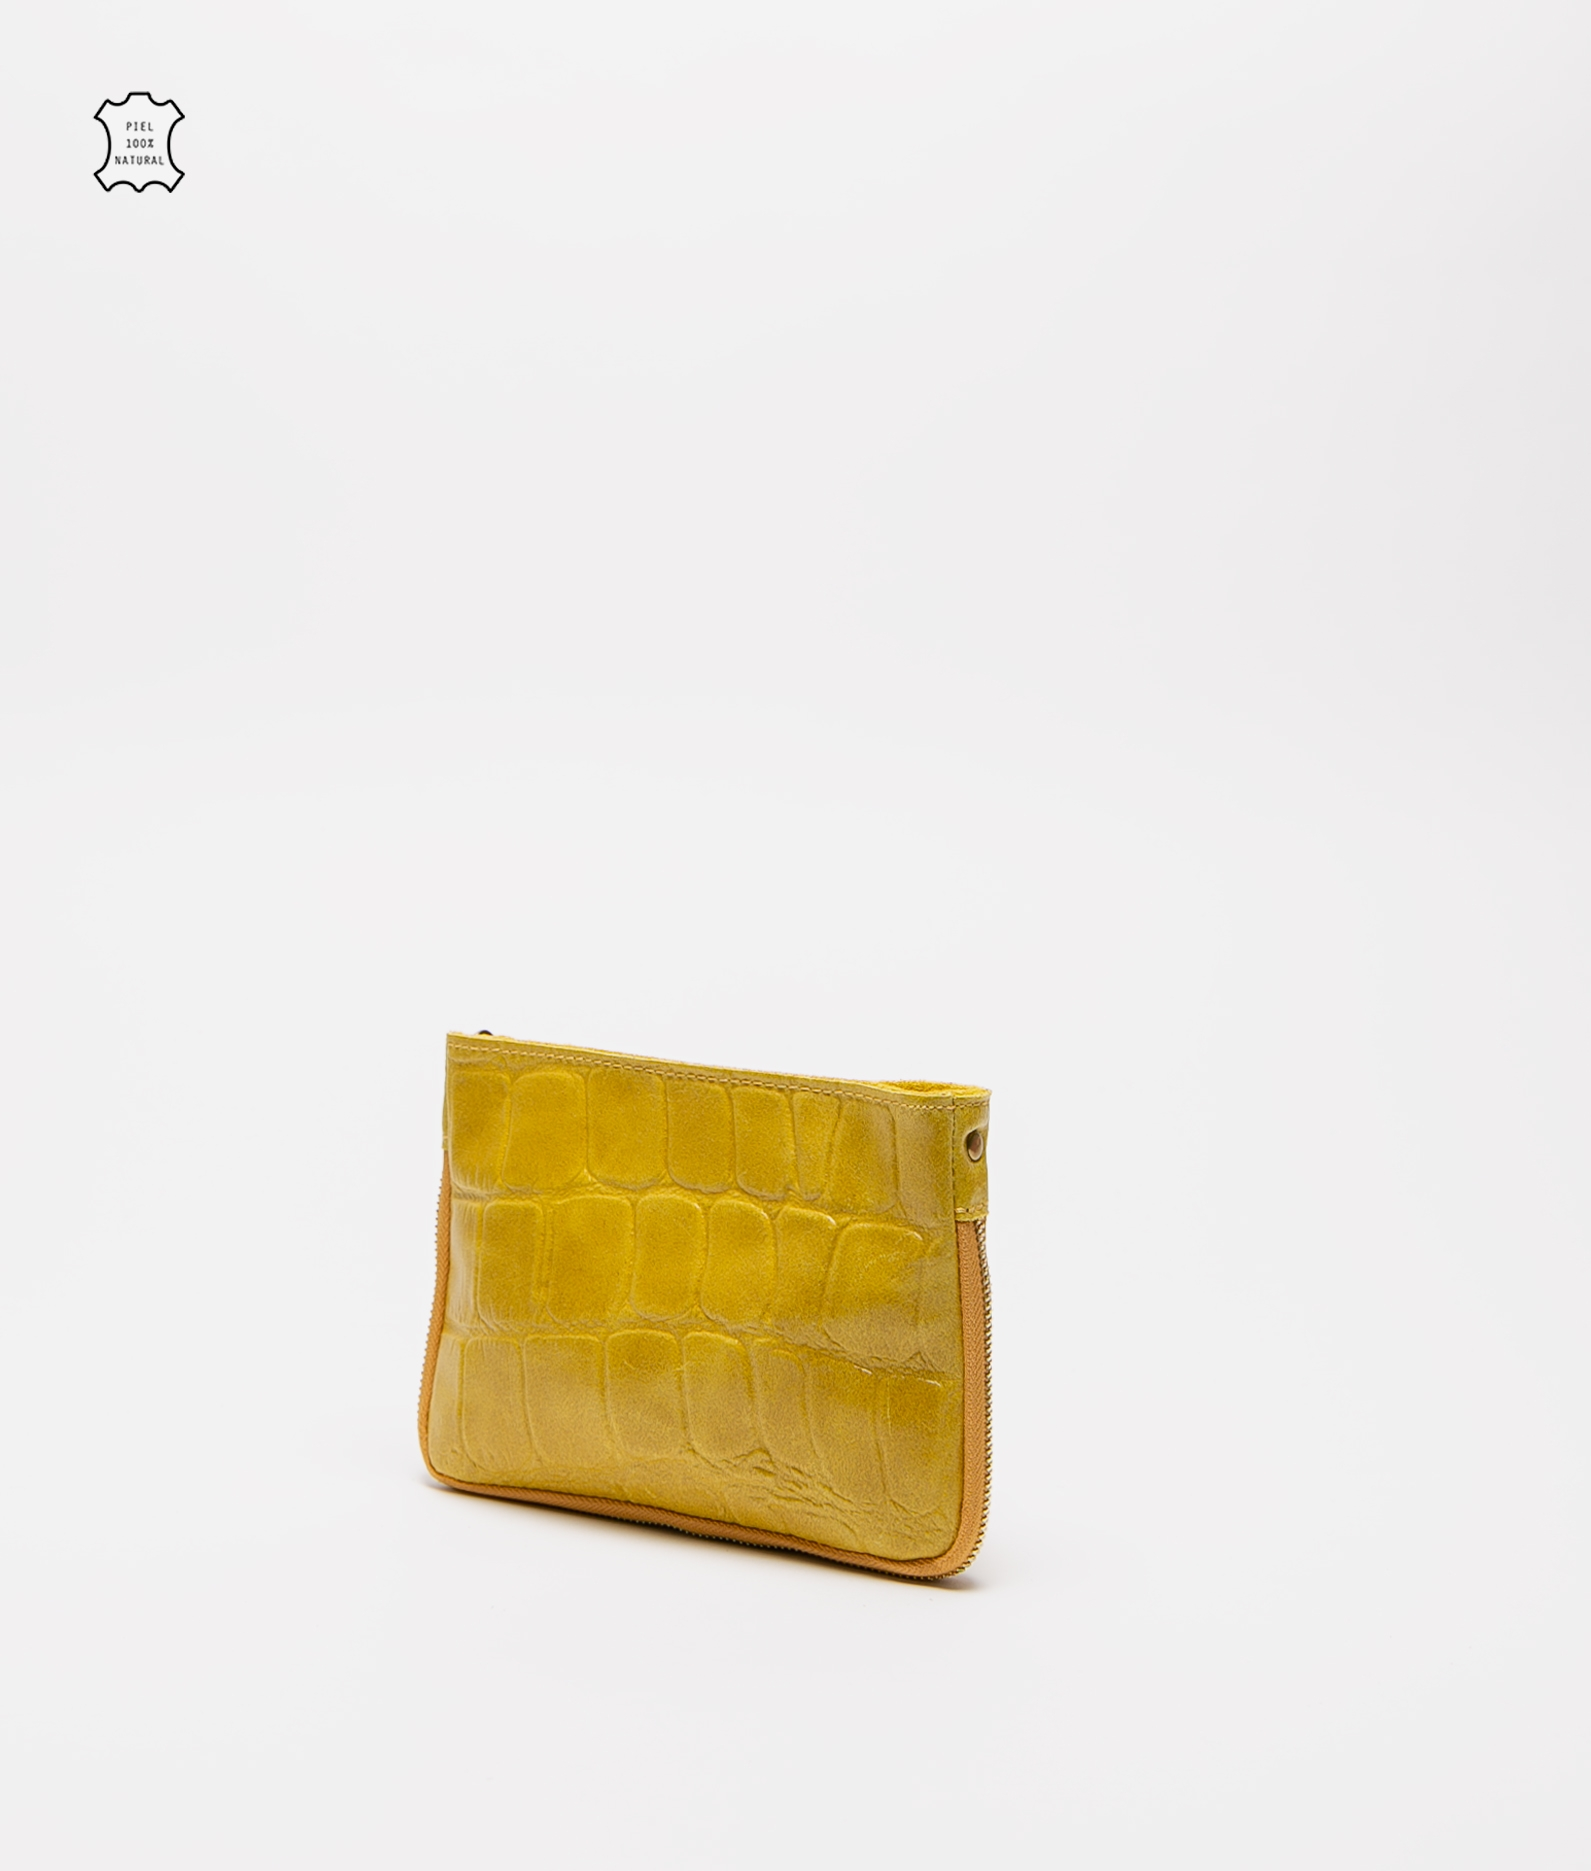 Finland leather crossbody bag - yellow